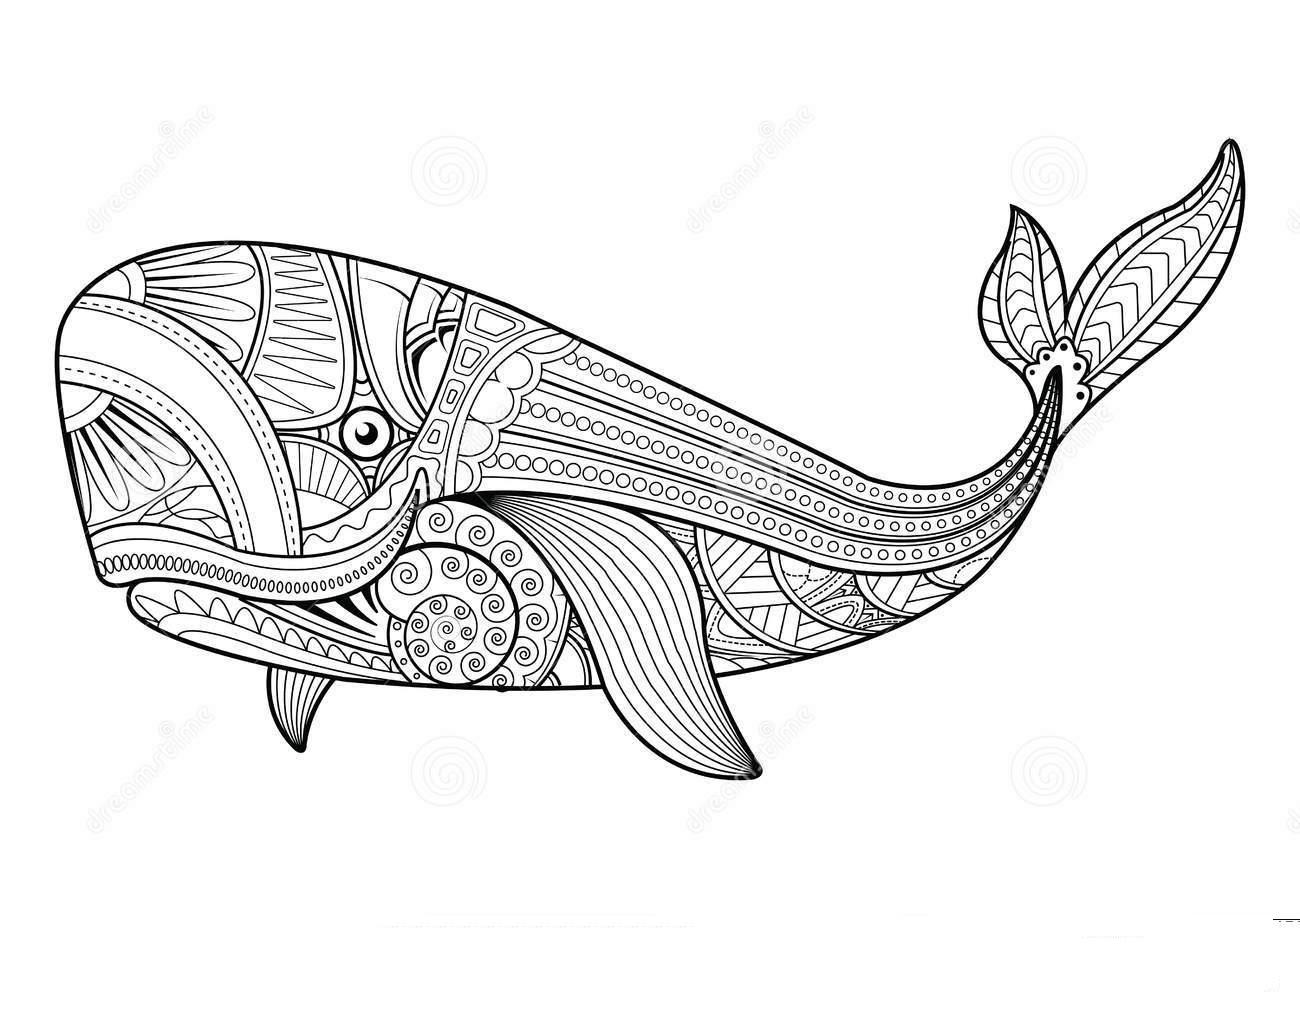 Mandala Whale Coloring Page - Free Printable Coloring ...